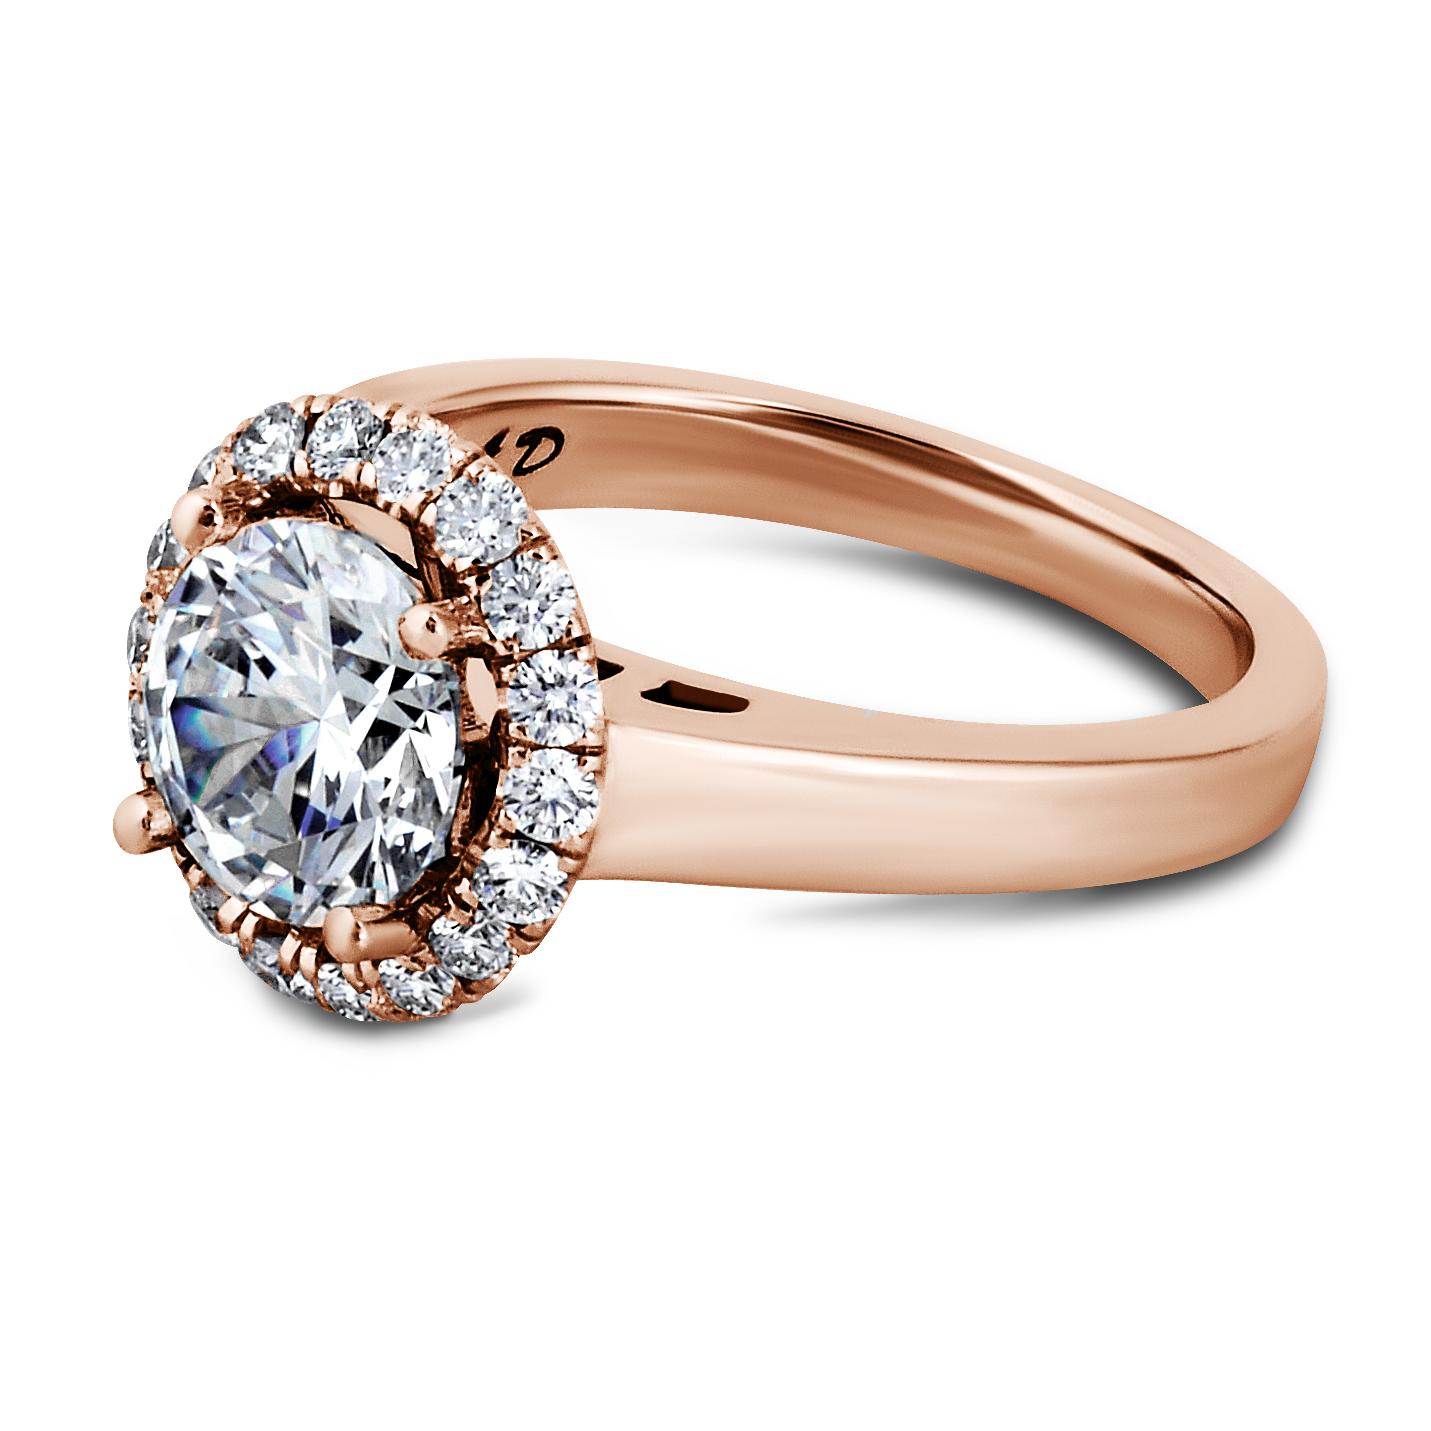 Diamond Halo Ring Set in Rose Gold